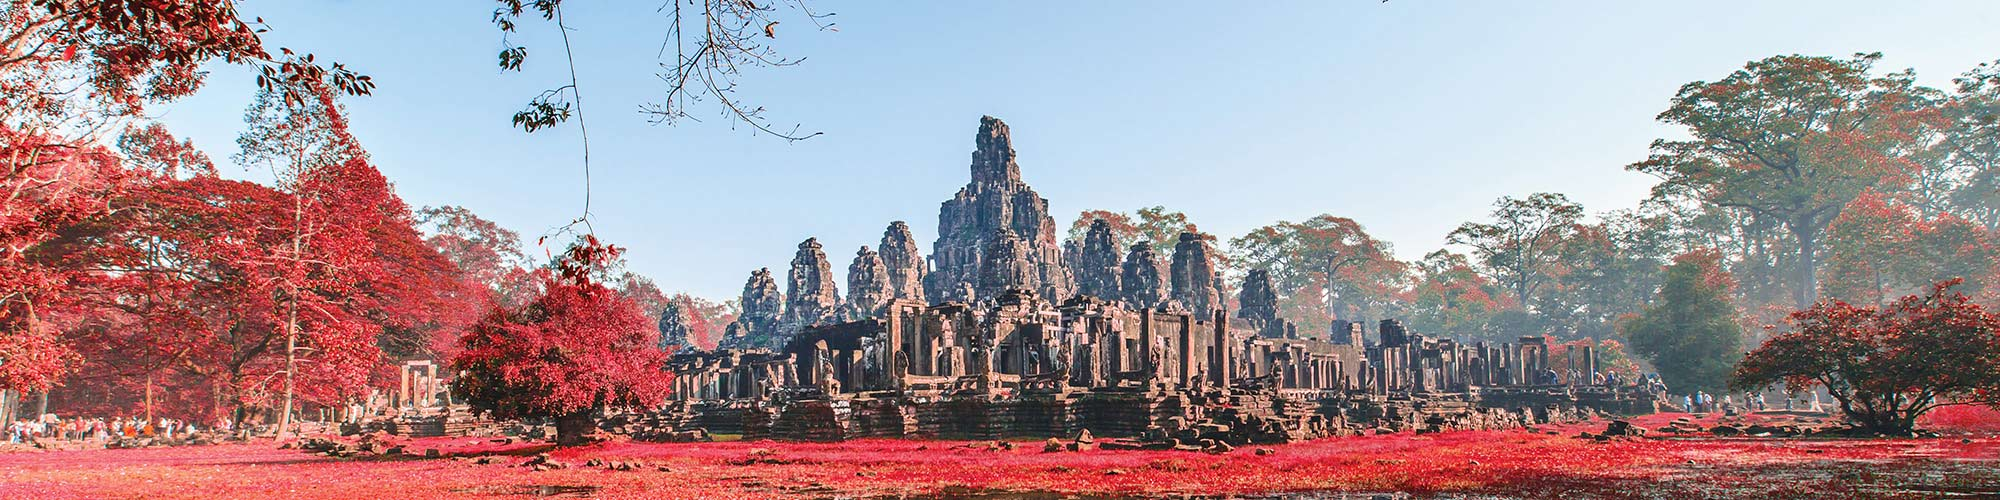 cambodia-banner-4.jpg